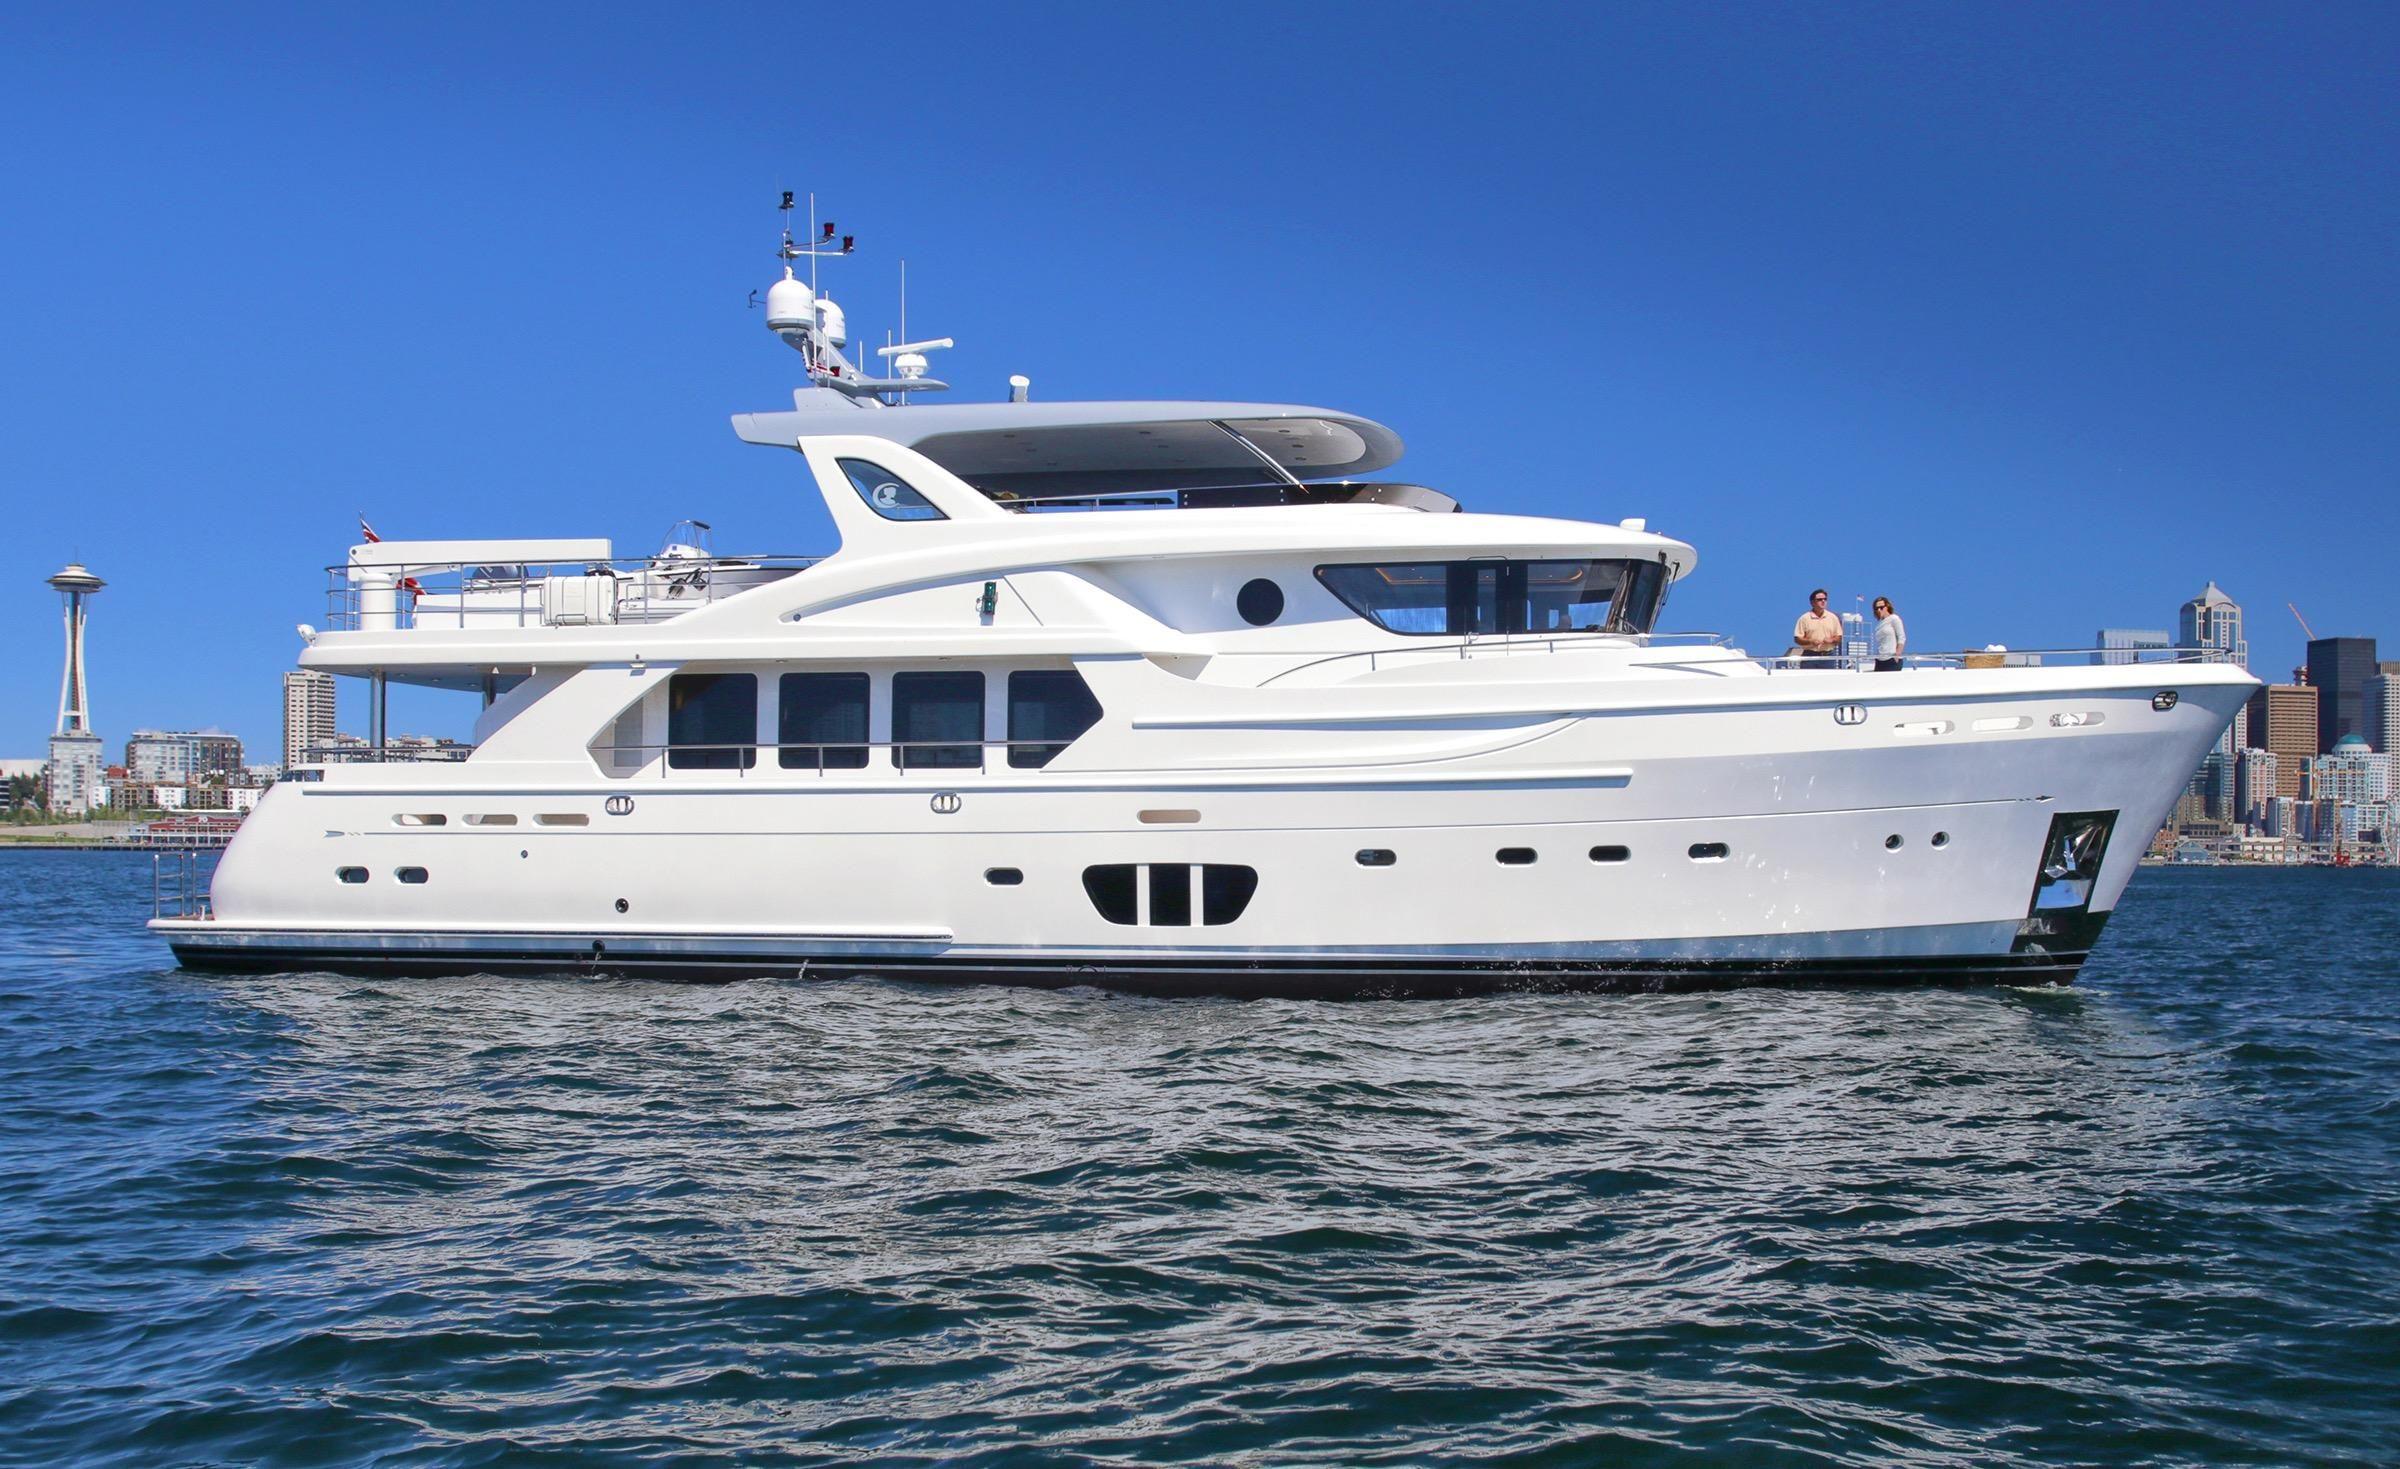 2016 Selene 92 Ocean Explorer Moteur Bateau 224 Vendre Www Yachtworld Fr